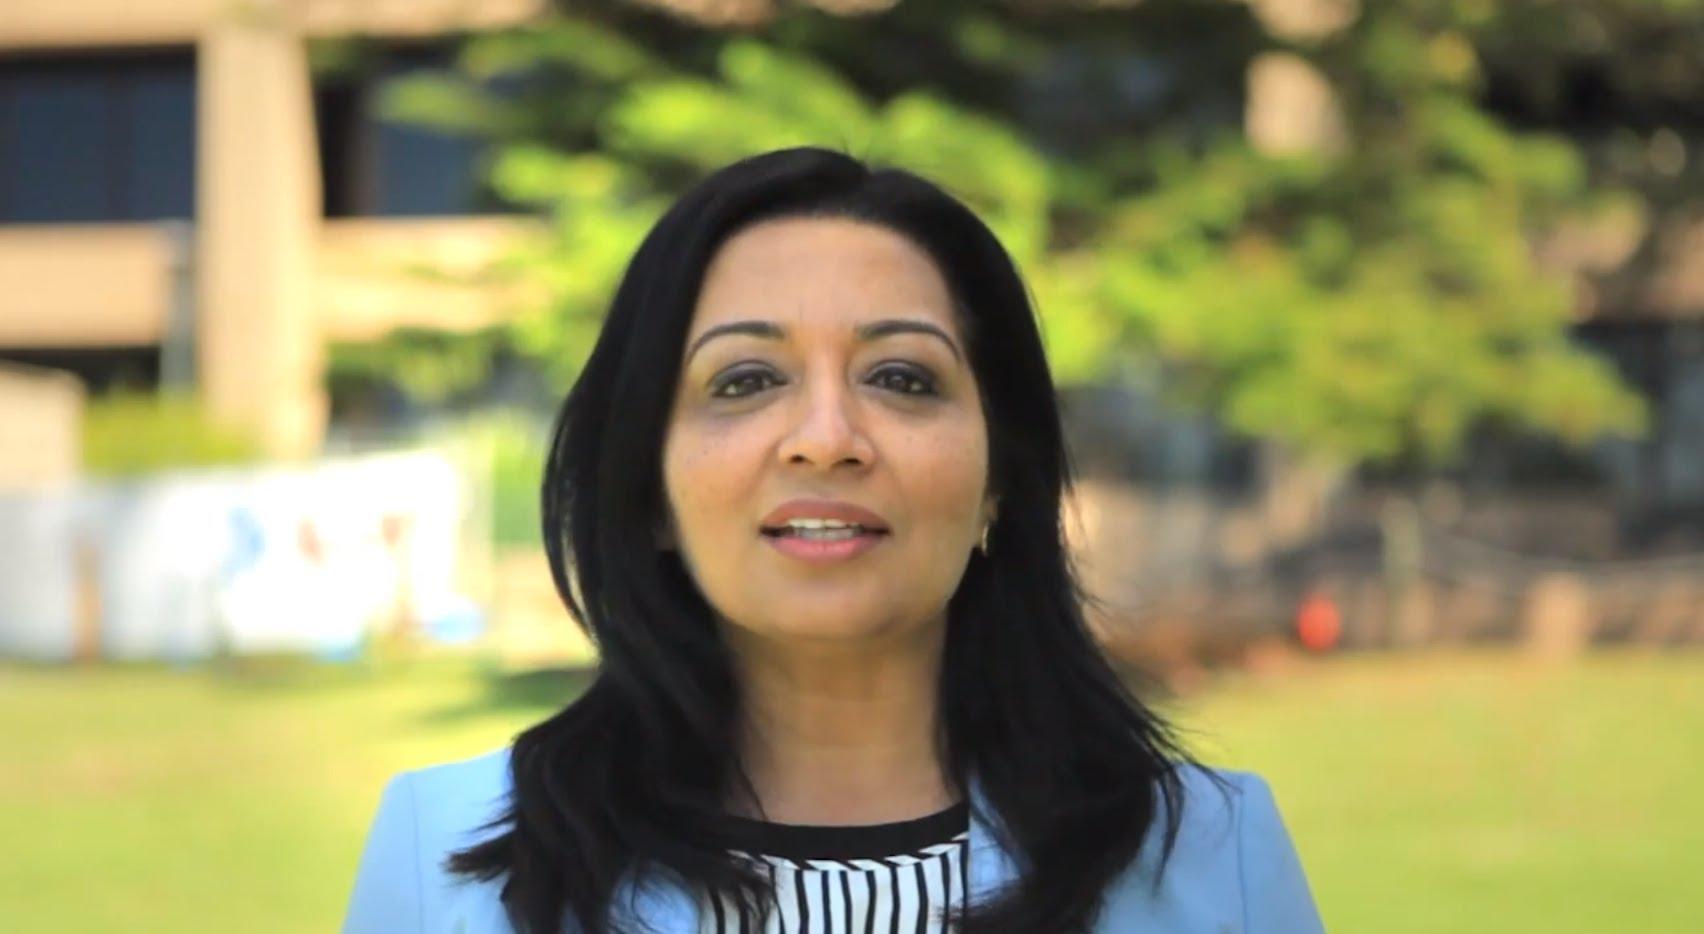 Mehreen Faruqi, Pakistani-born Australian politician, Australian Green Party, Muslim woman, Senate Pakistani-origin, World news